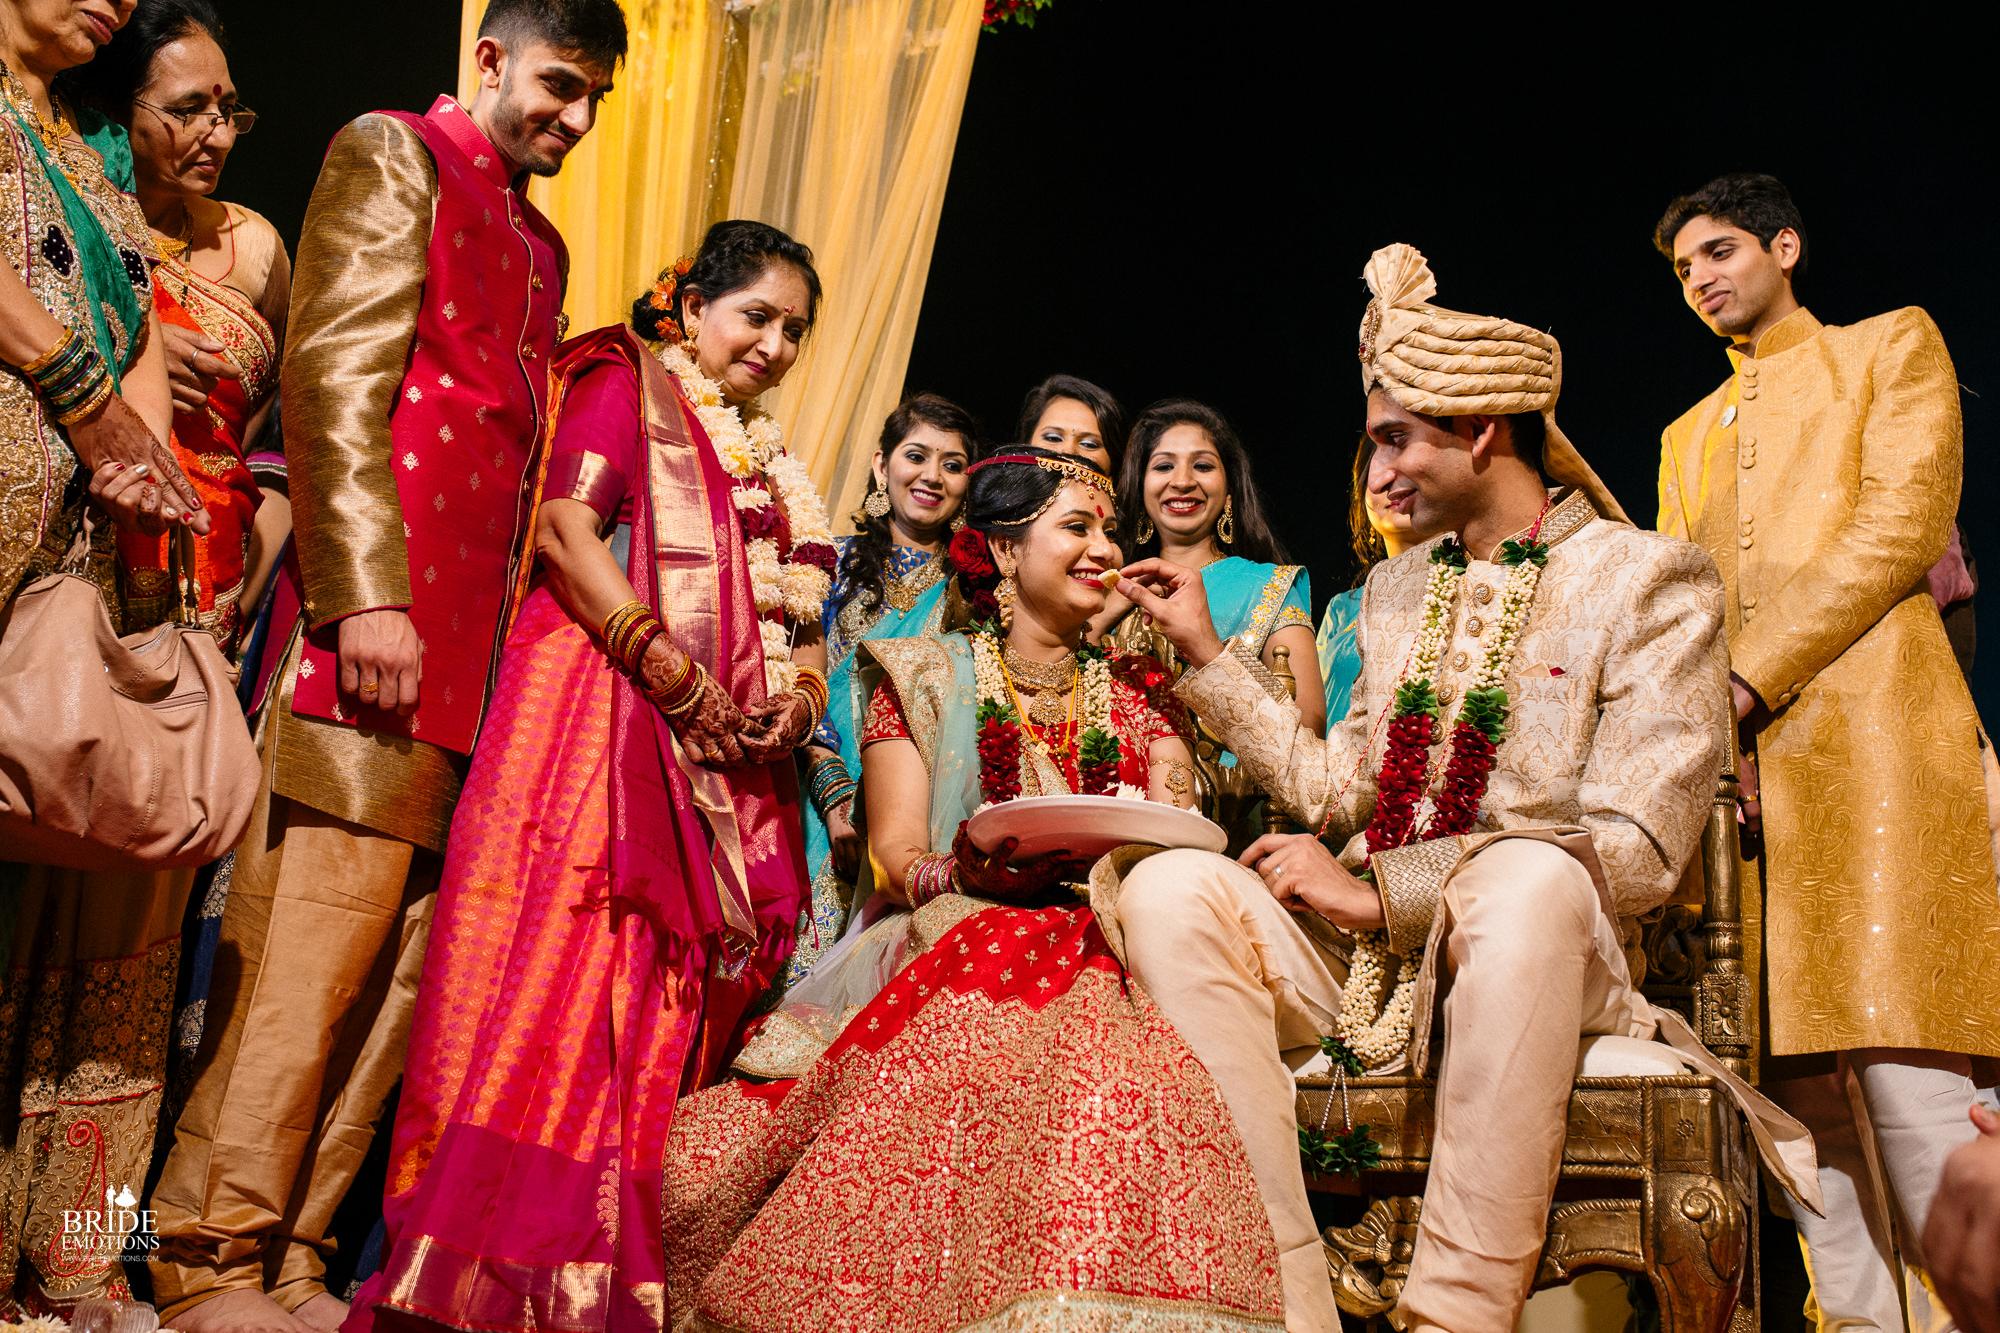 Wedding_Photo_Gallery_274.jpg